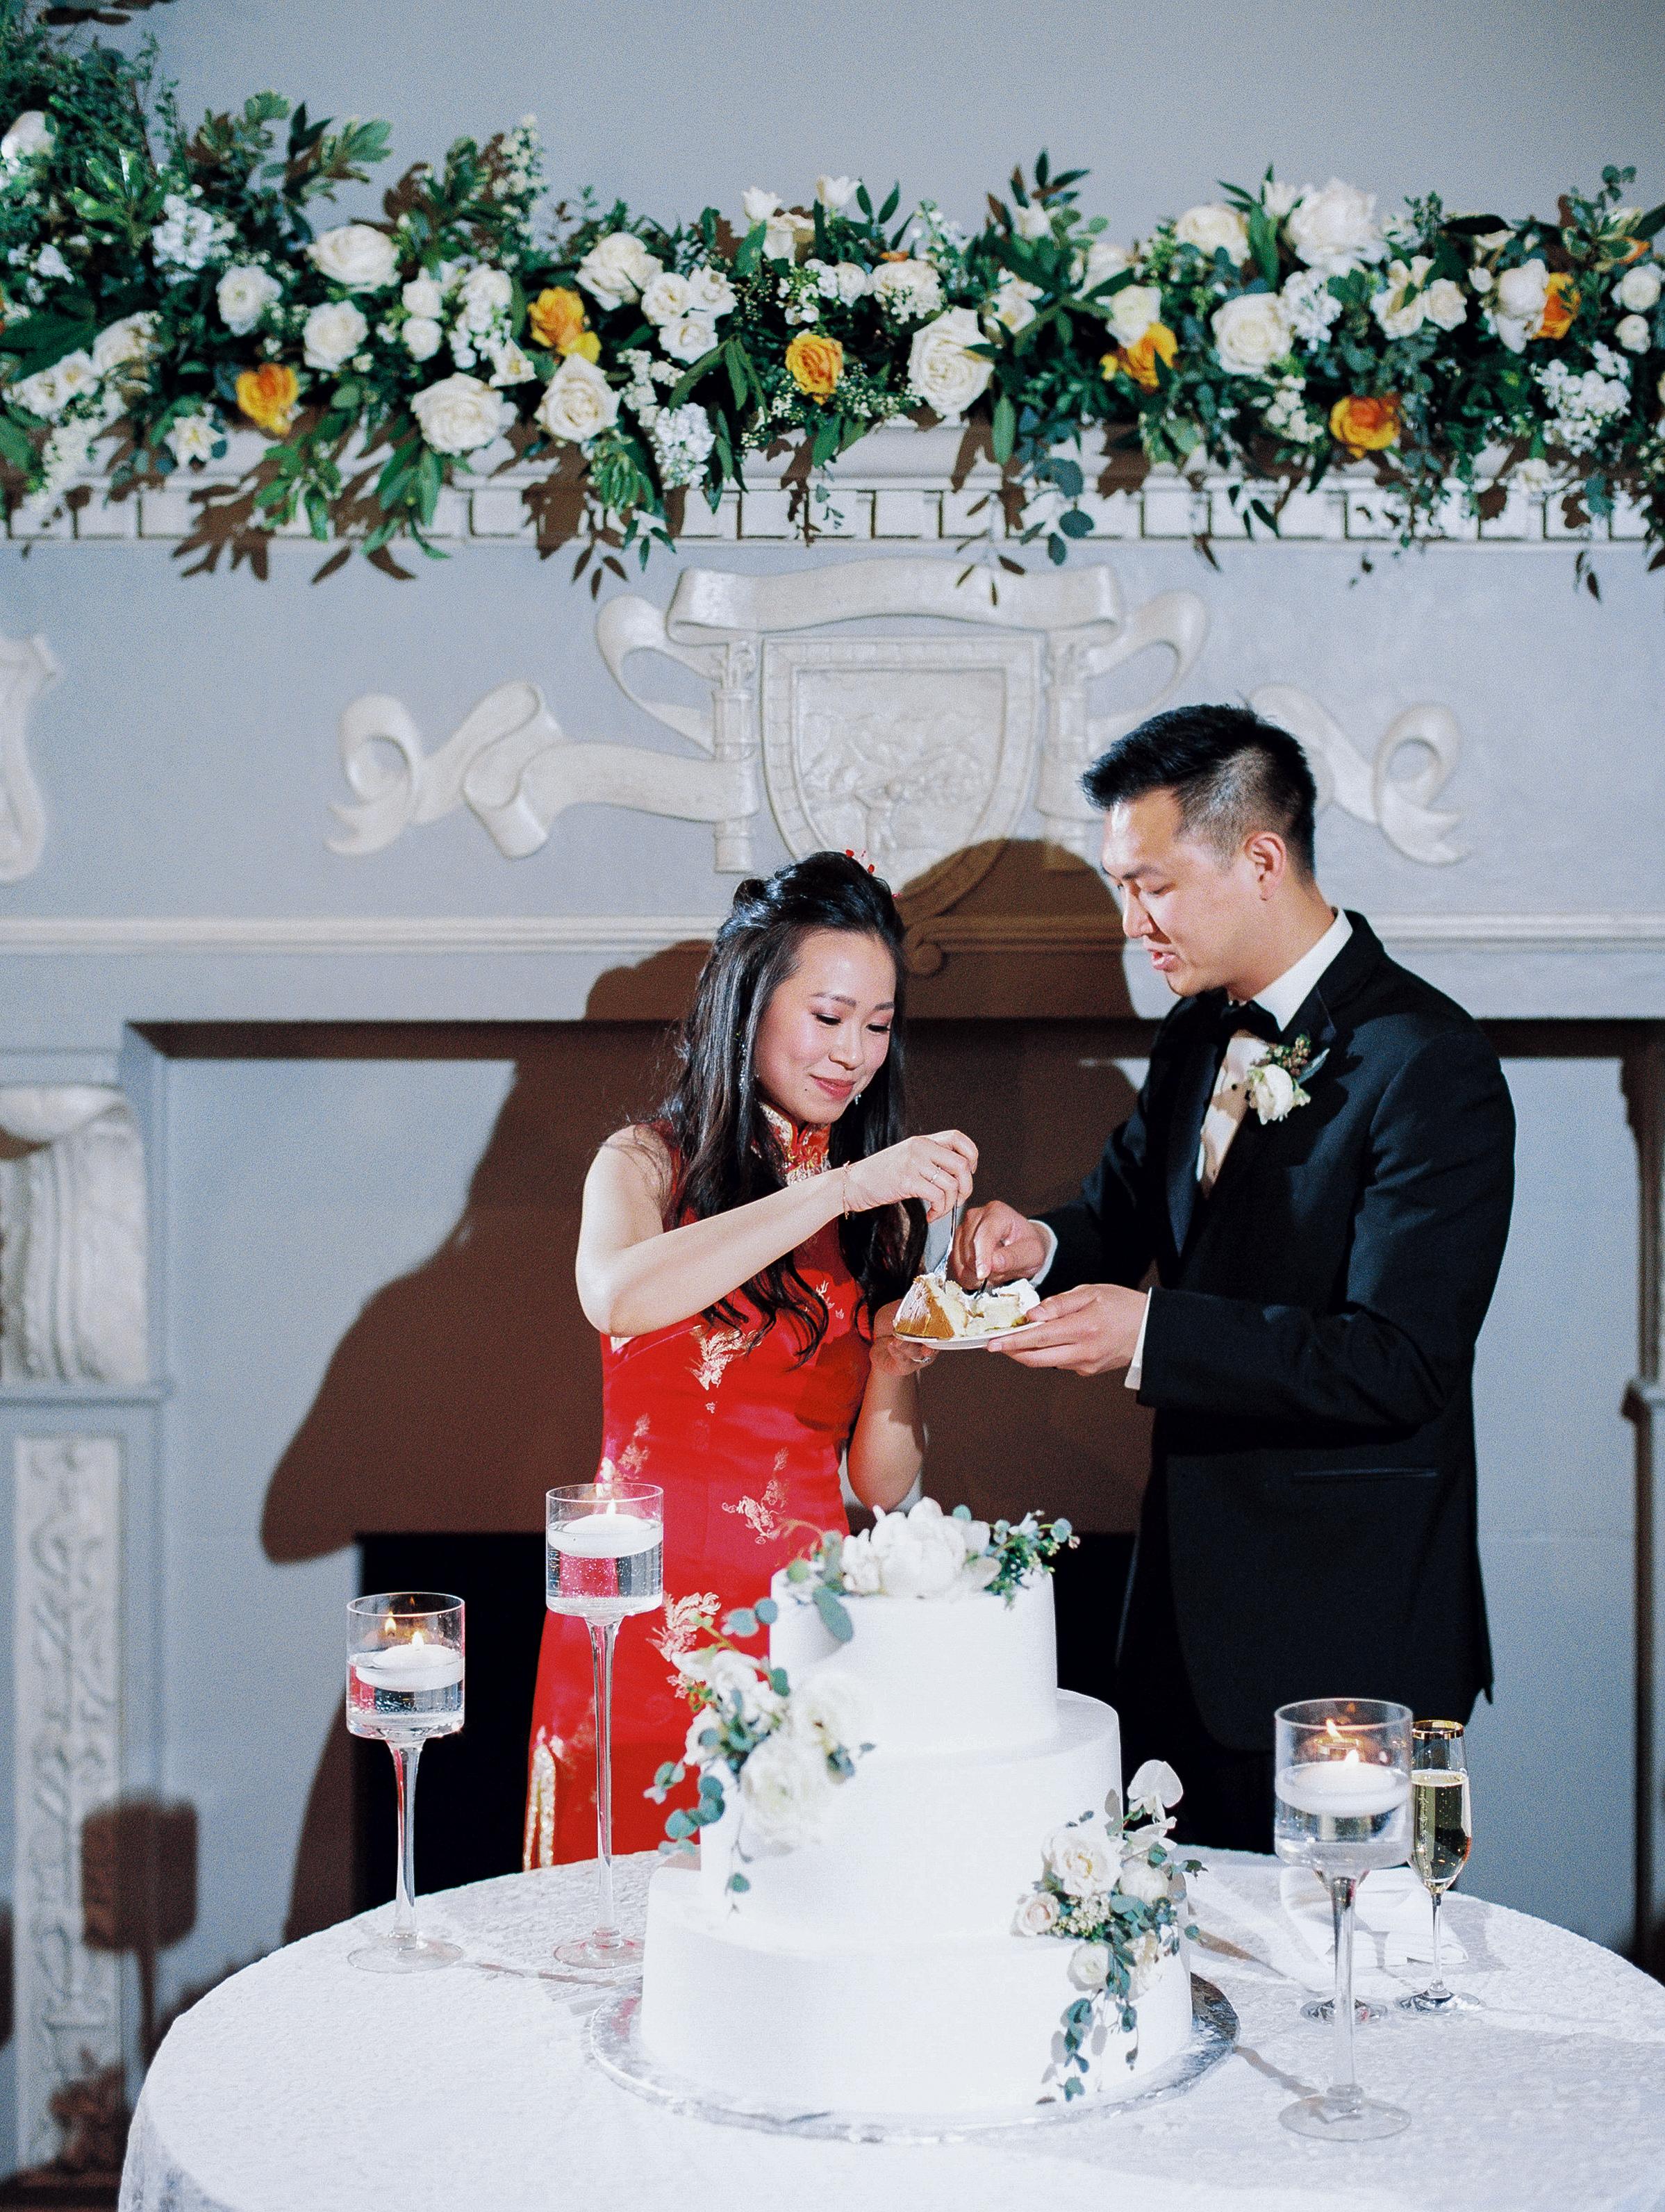 weddingaltadenatowncountryclubrachelallenreception-29.jpg